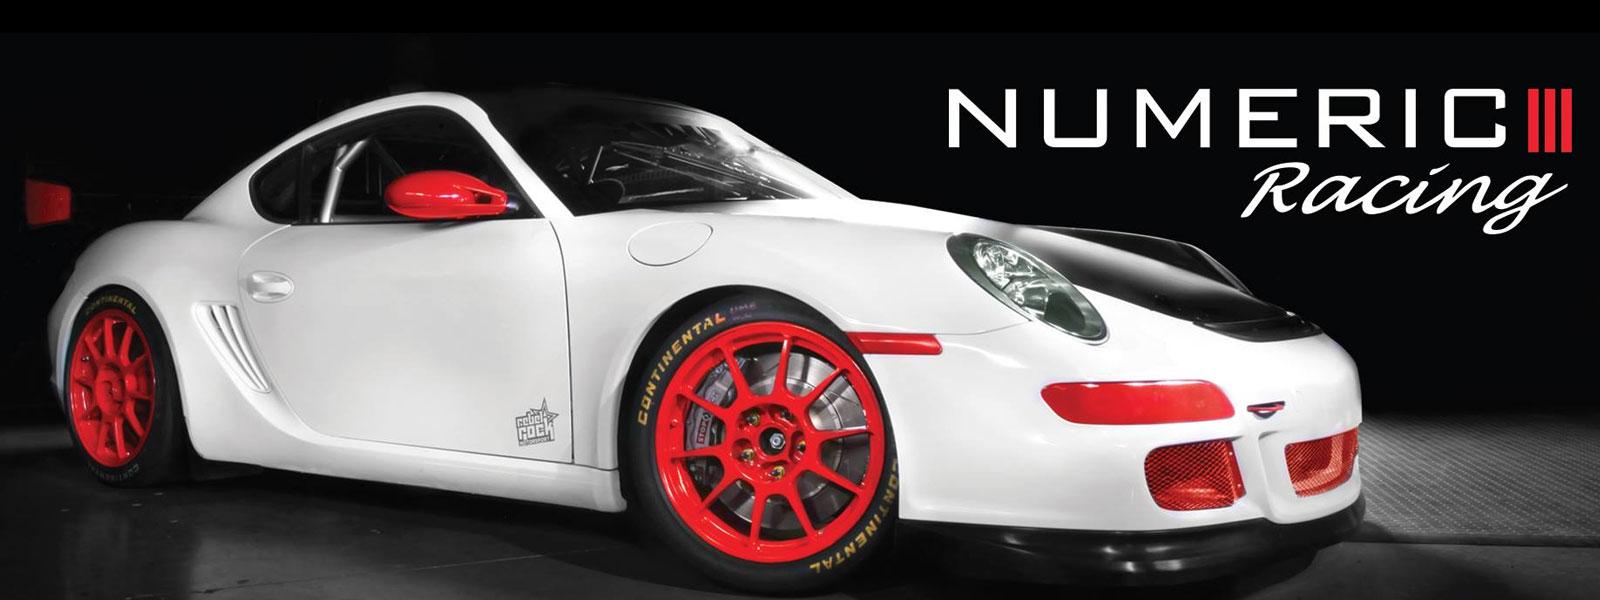 Numeric Racing